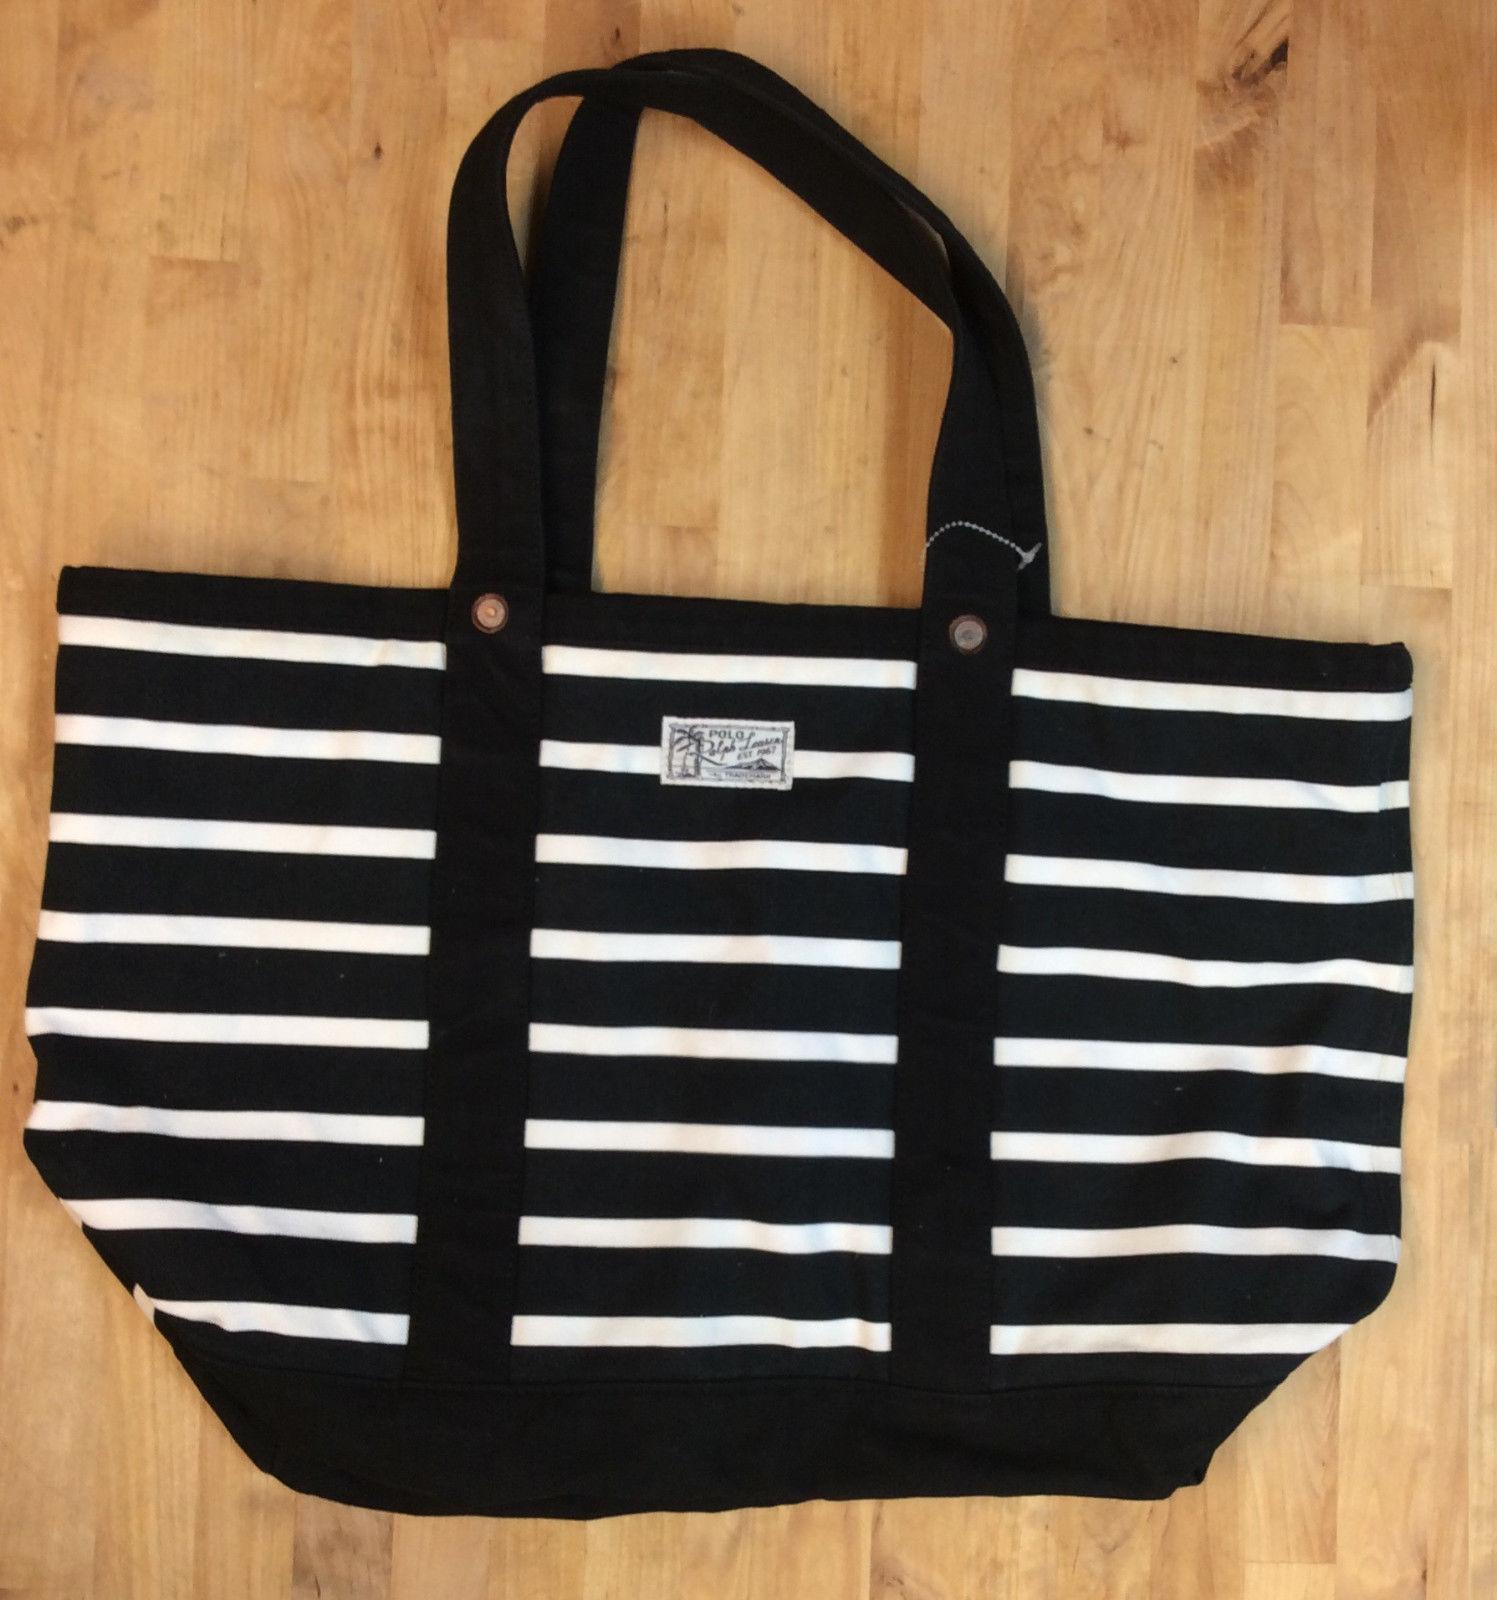 S l1600. S l1600. Previous.  145 Polo Ralph Lauren Womens Canvas Striped  Tote Handbag 2ee5351e4fbc2